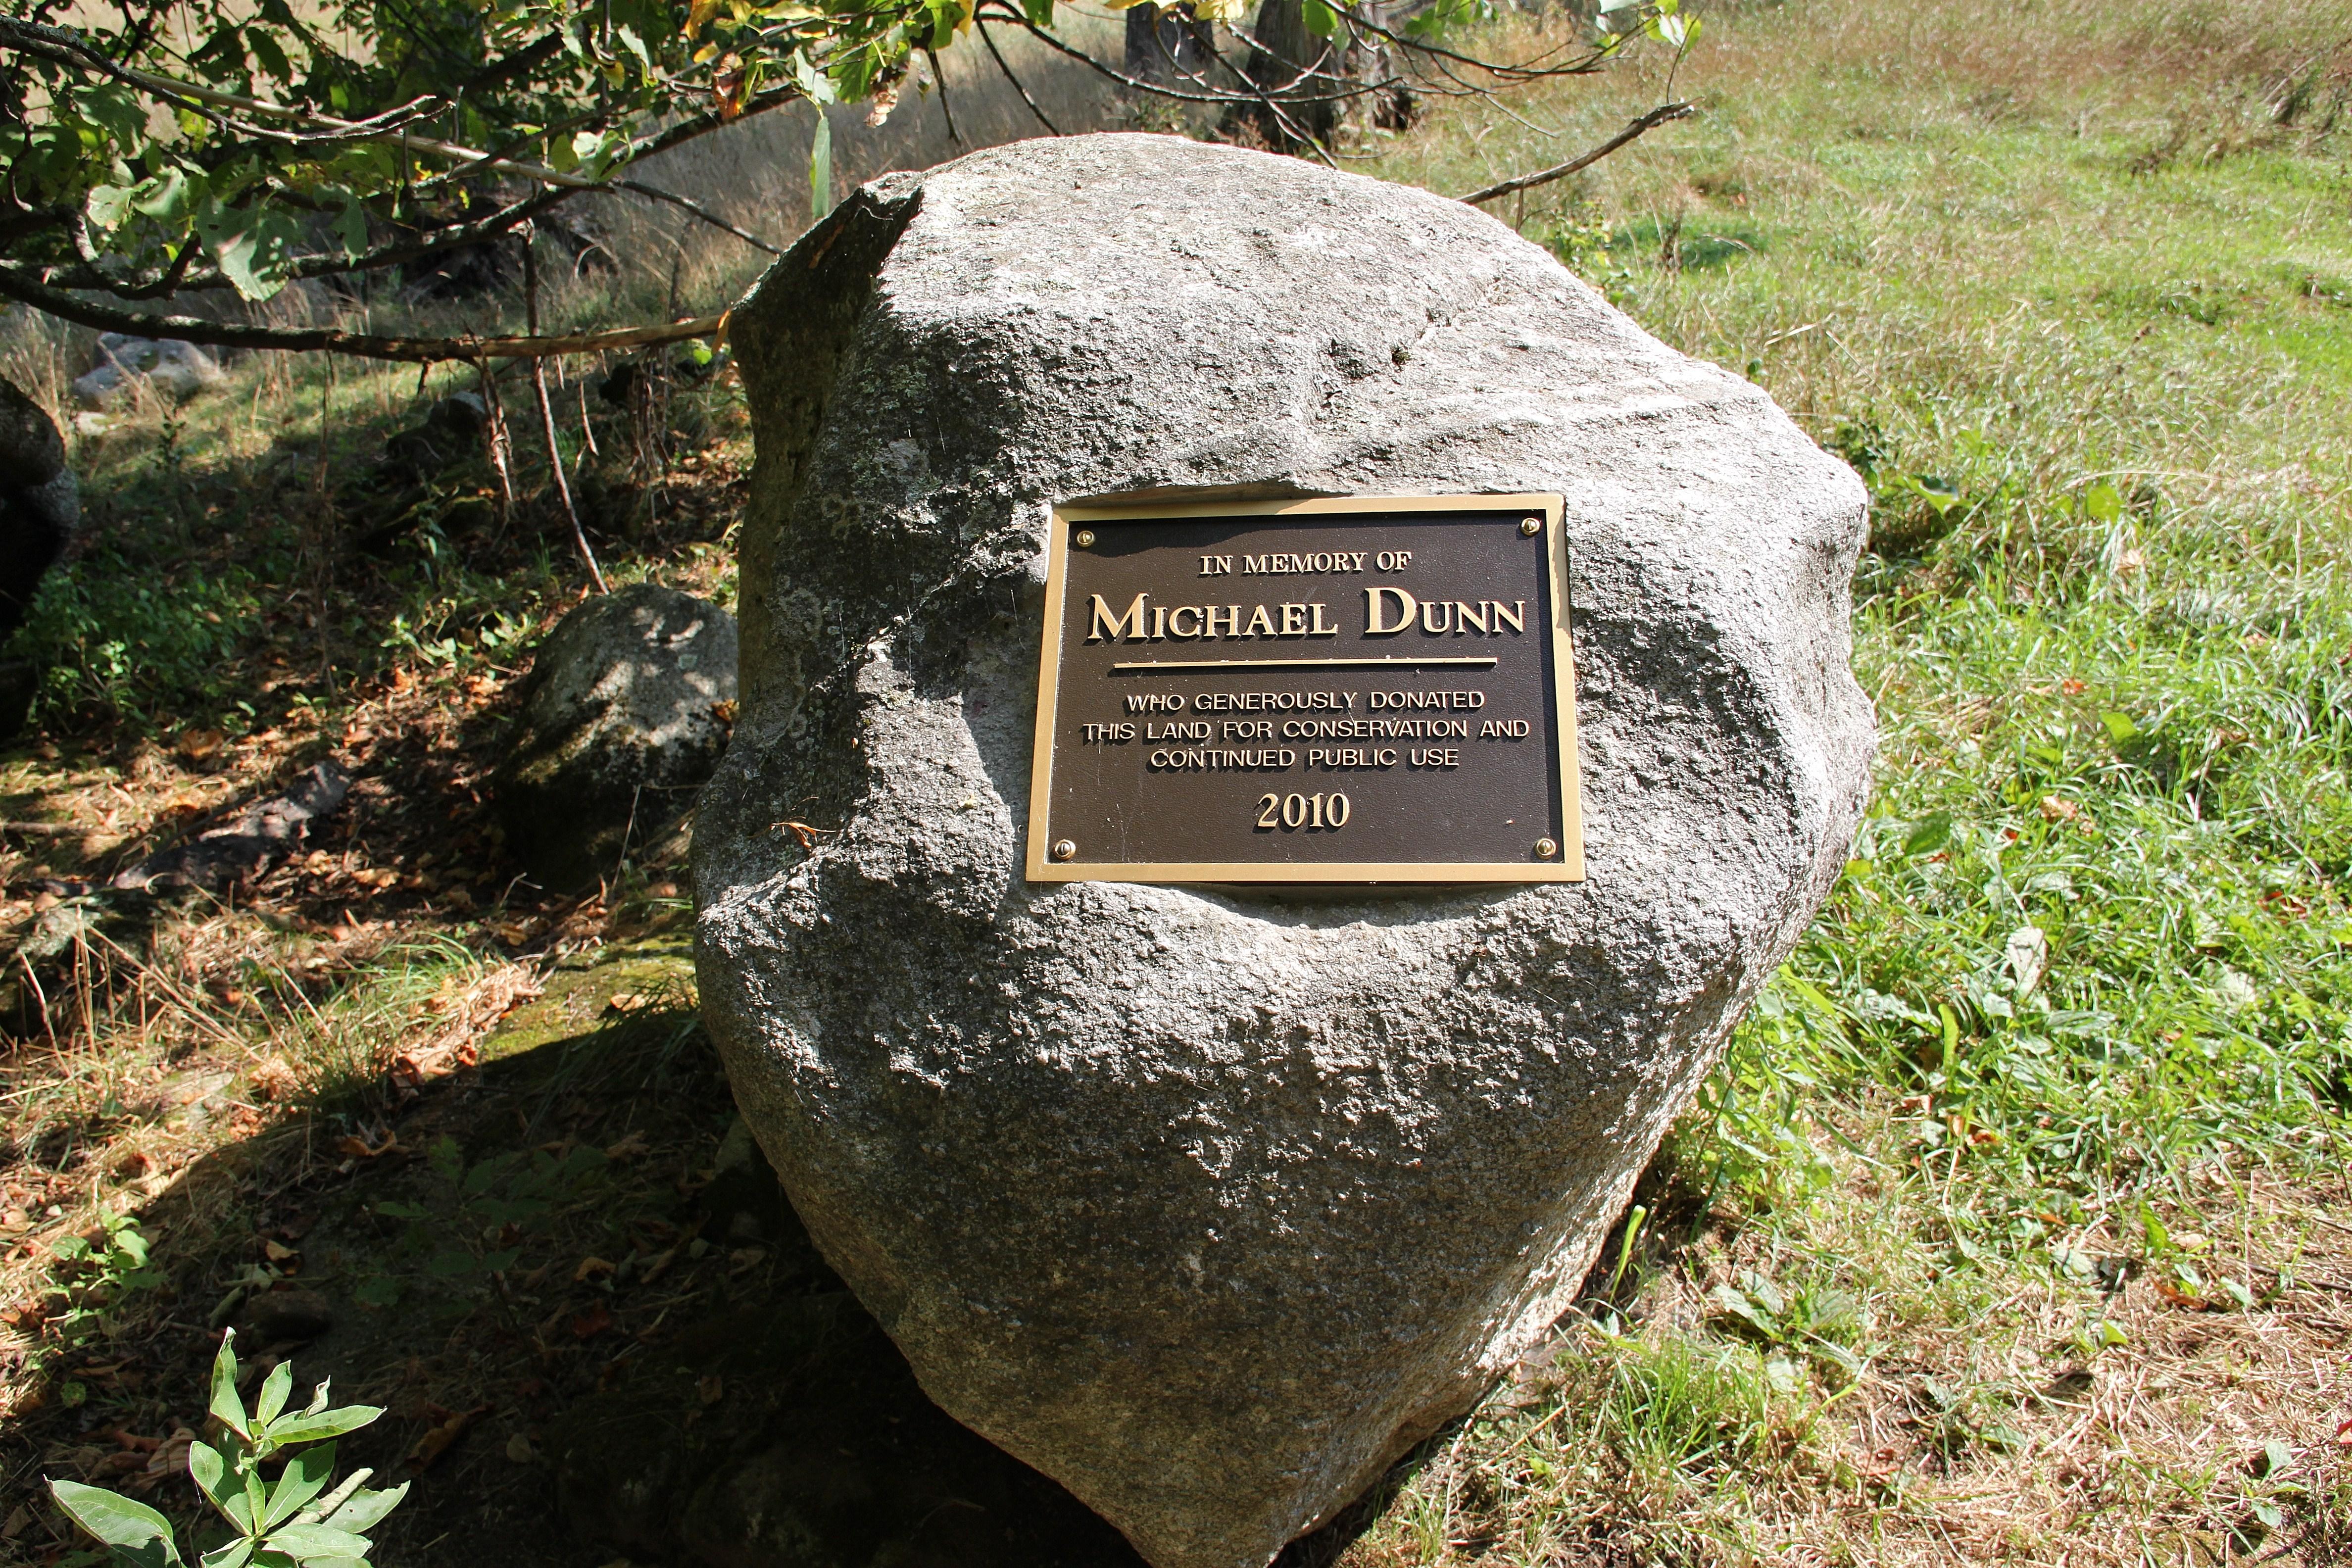 Dunn plaque eagle point unit of missisquoi national wildli for Dunn fish farm